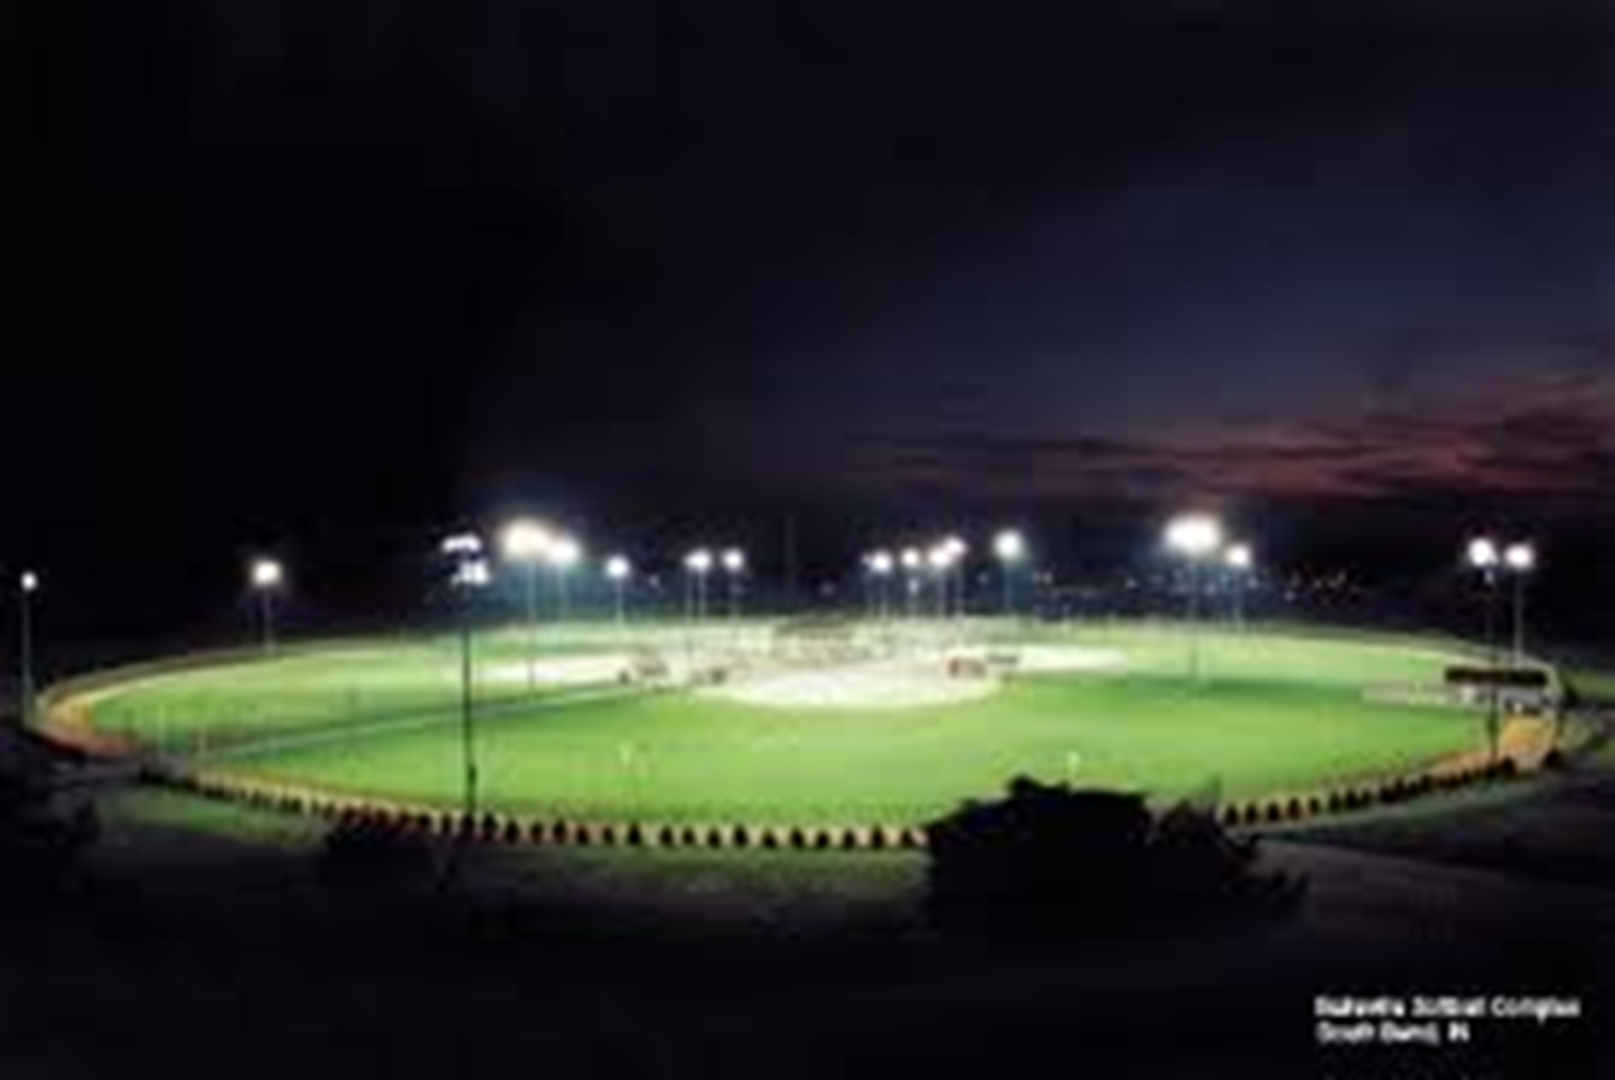 Byers Softball Complex